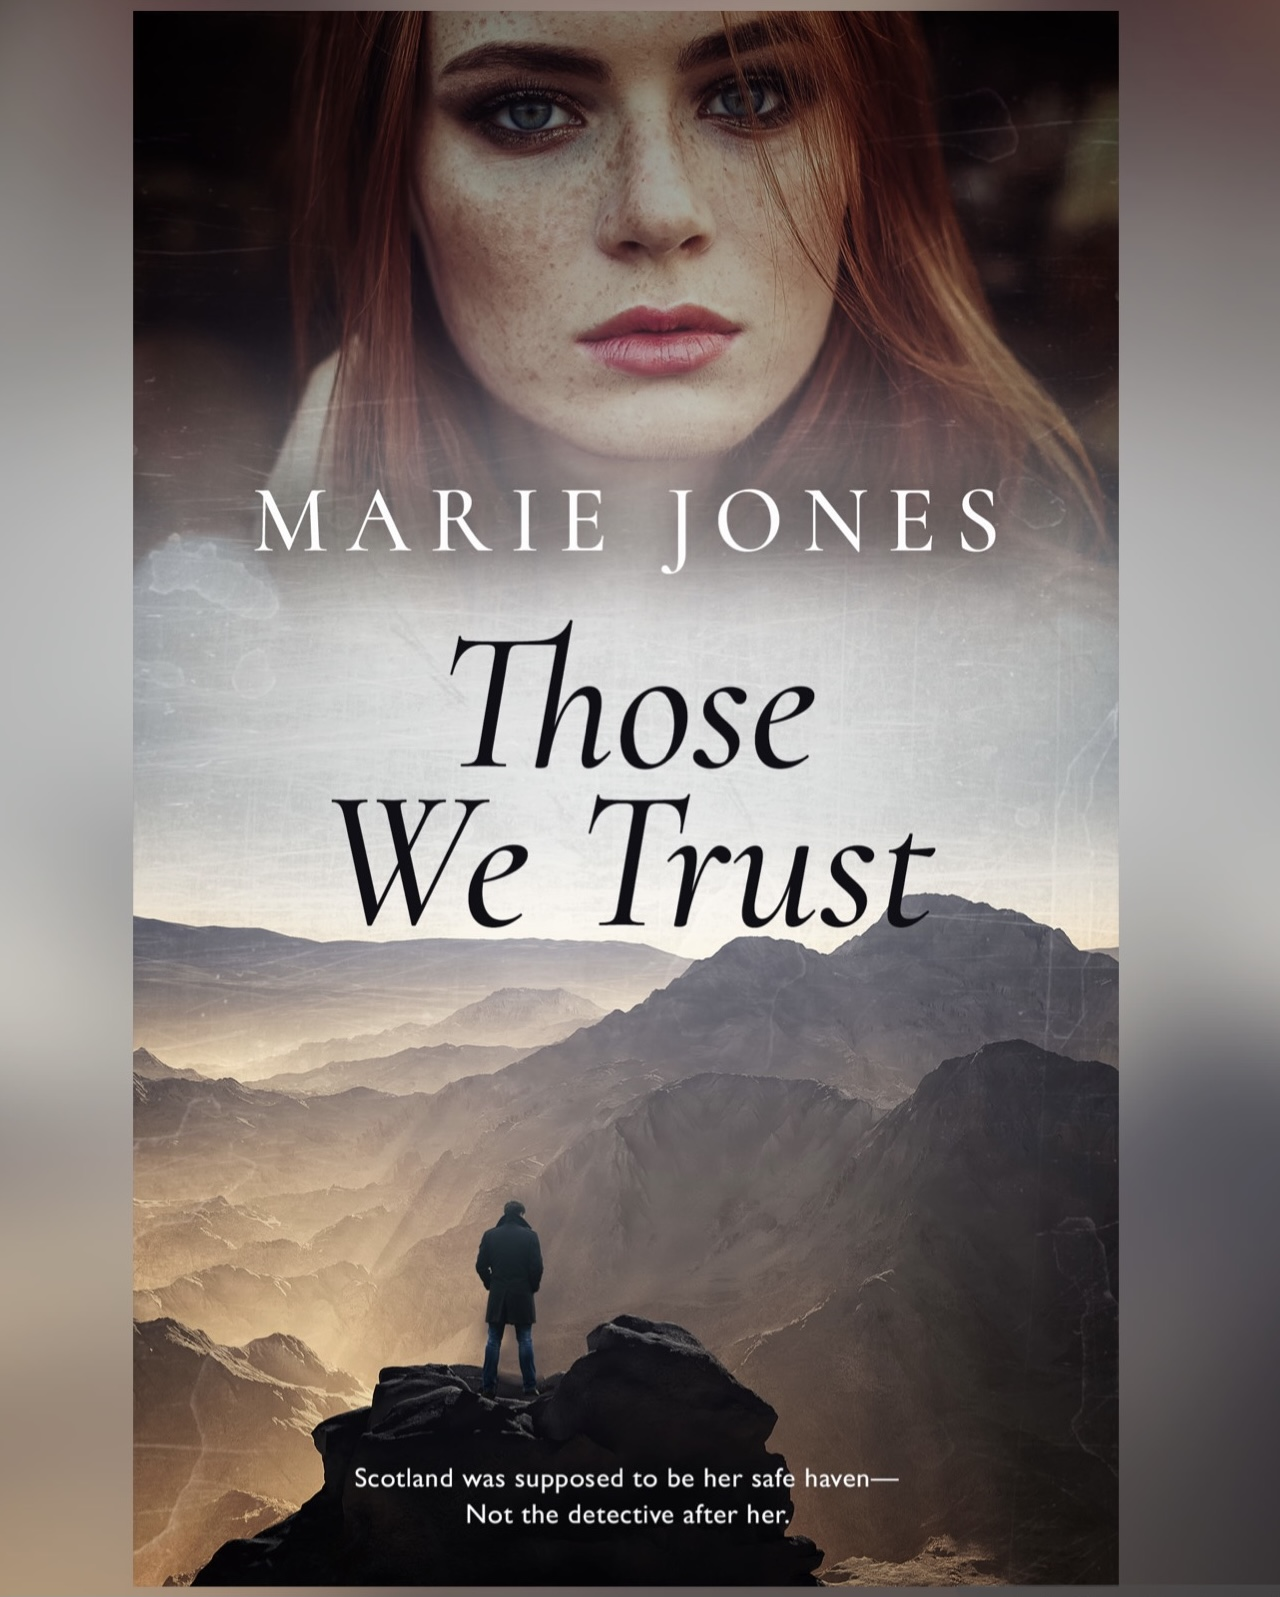 'Those We Trust' by Marie Jones